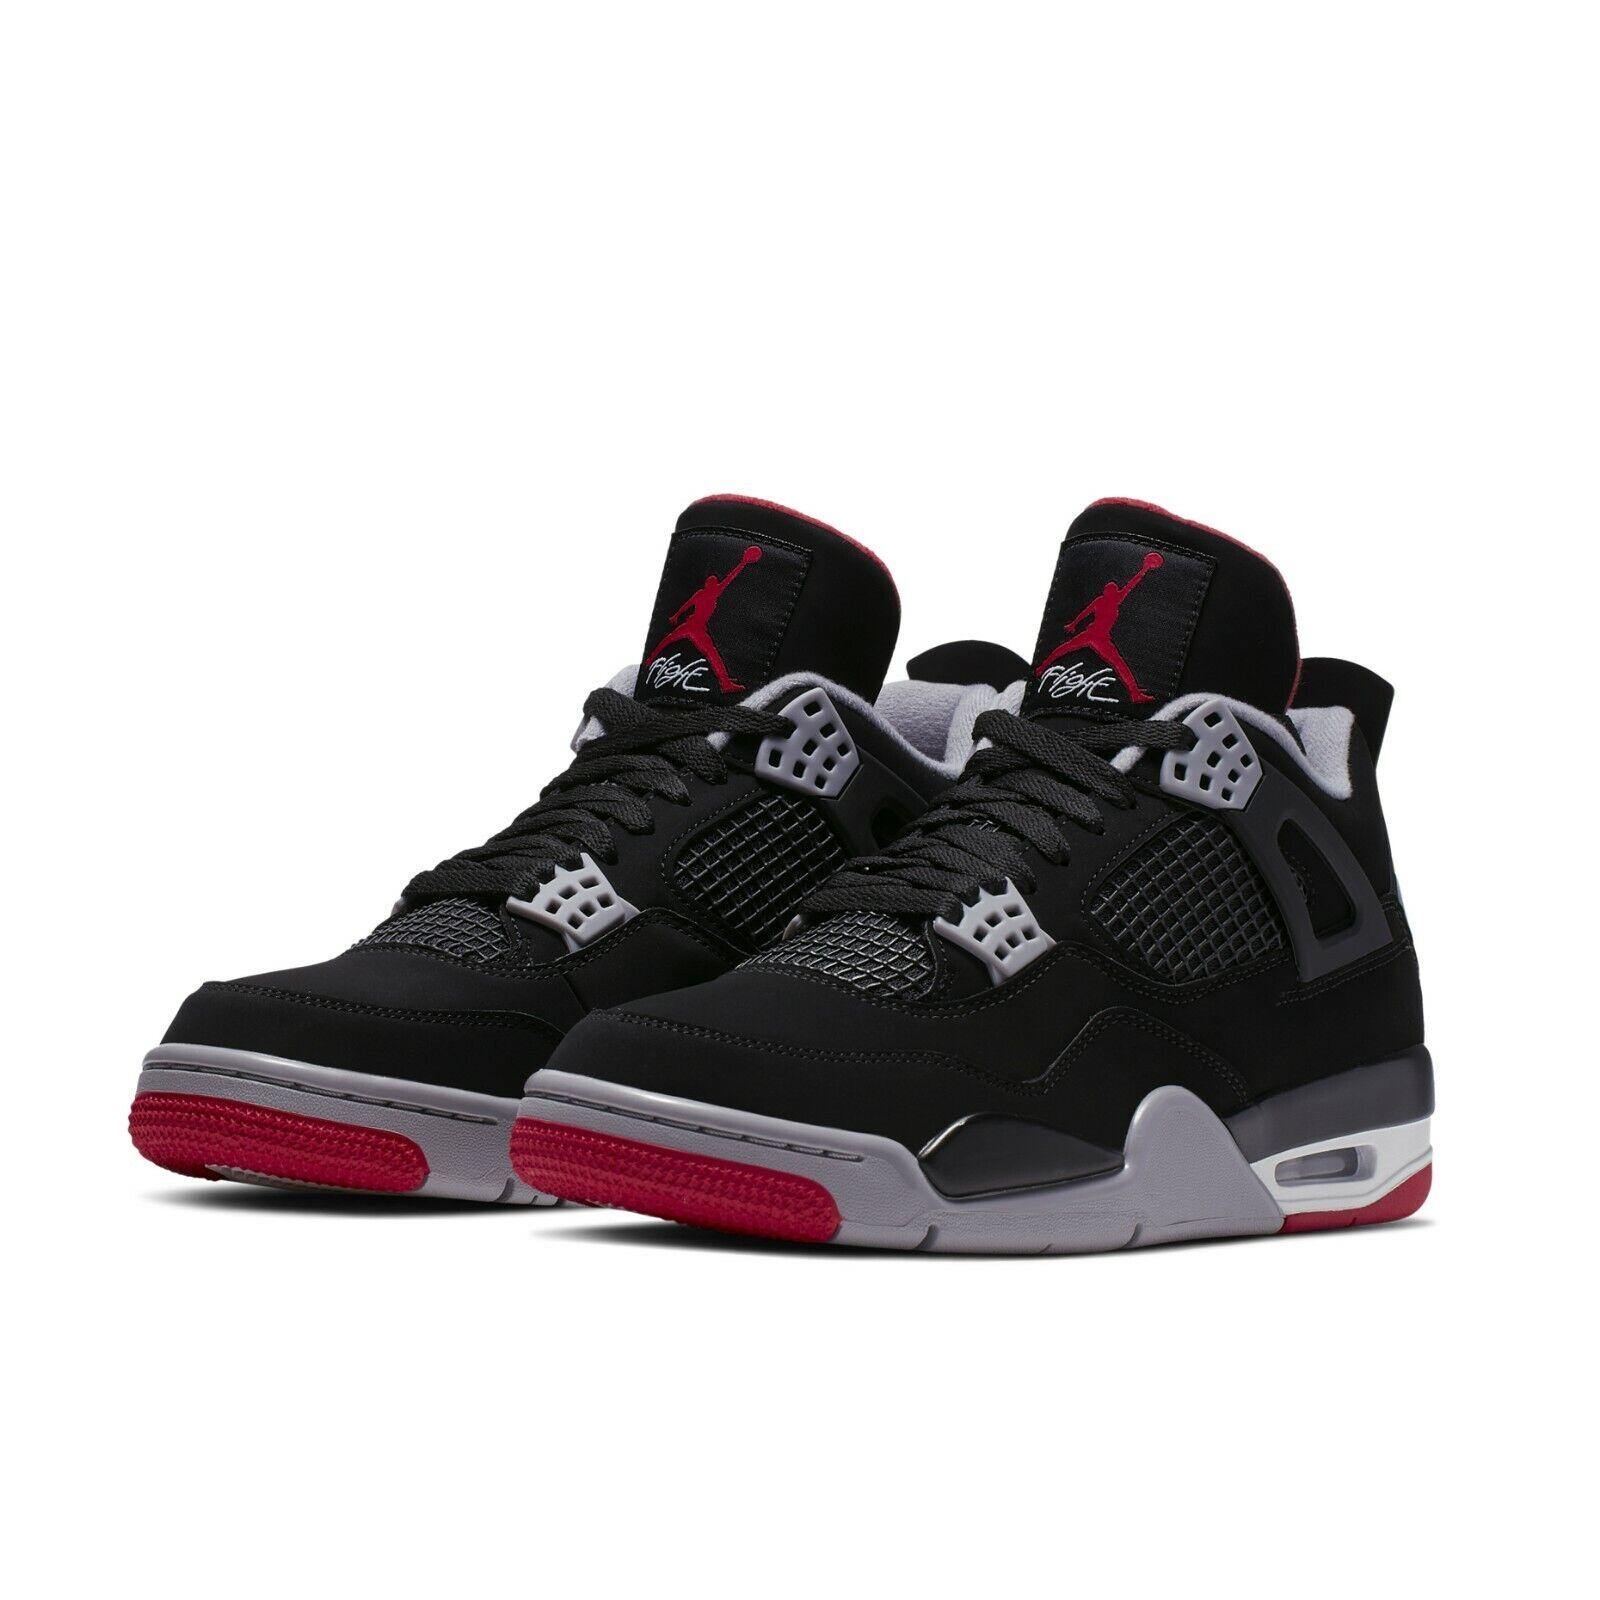 on sale dad5b f3752 Jordan 4 Bred Red Nike Mens Air 2019 Iv Aj4 Retro Og Black ...